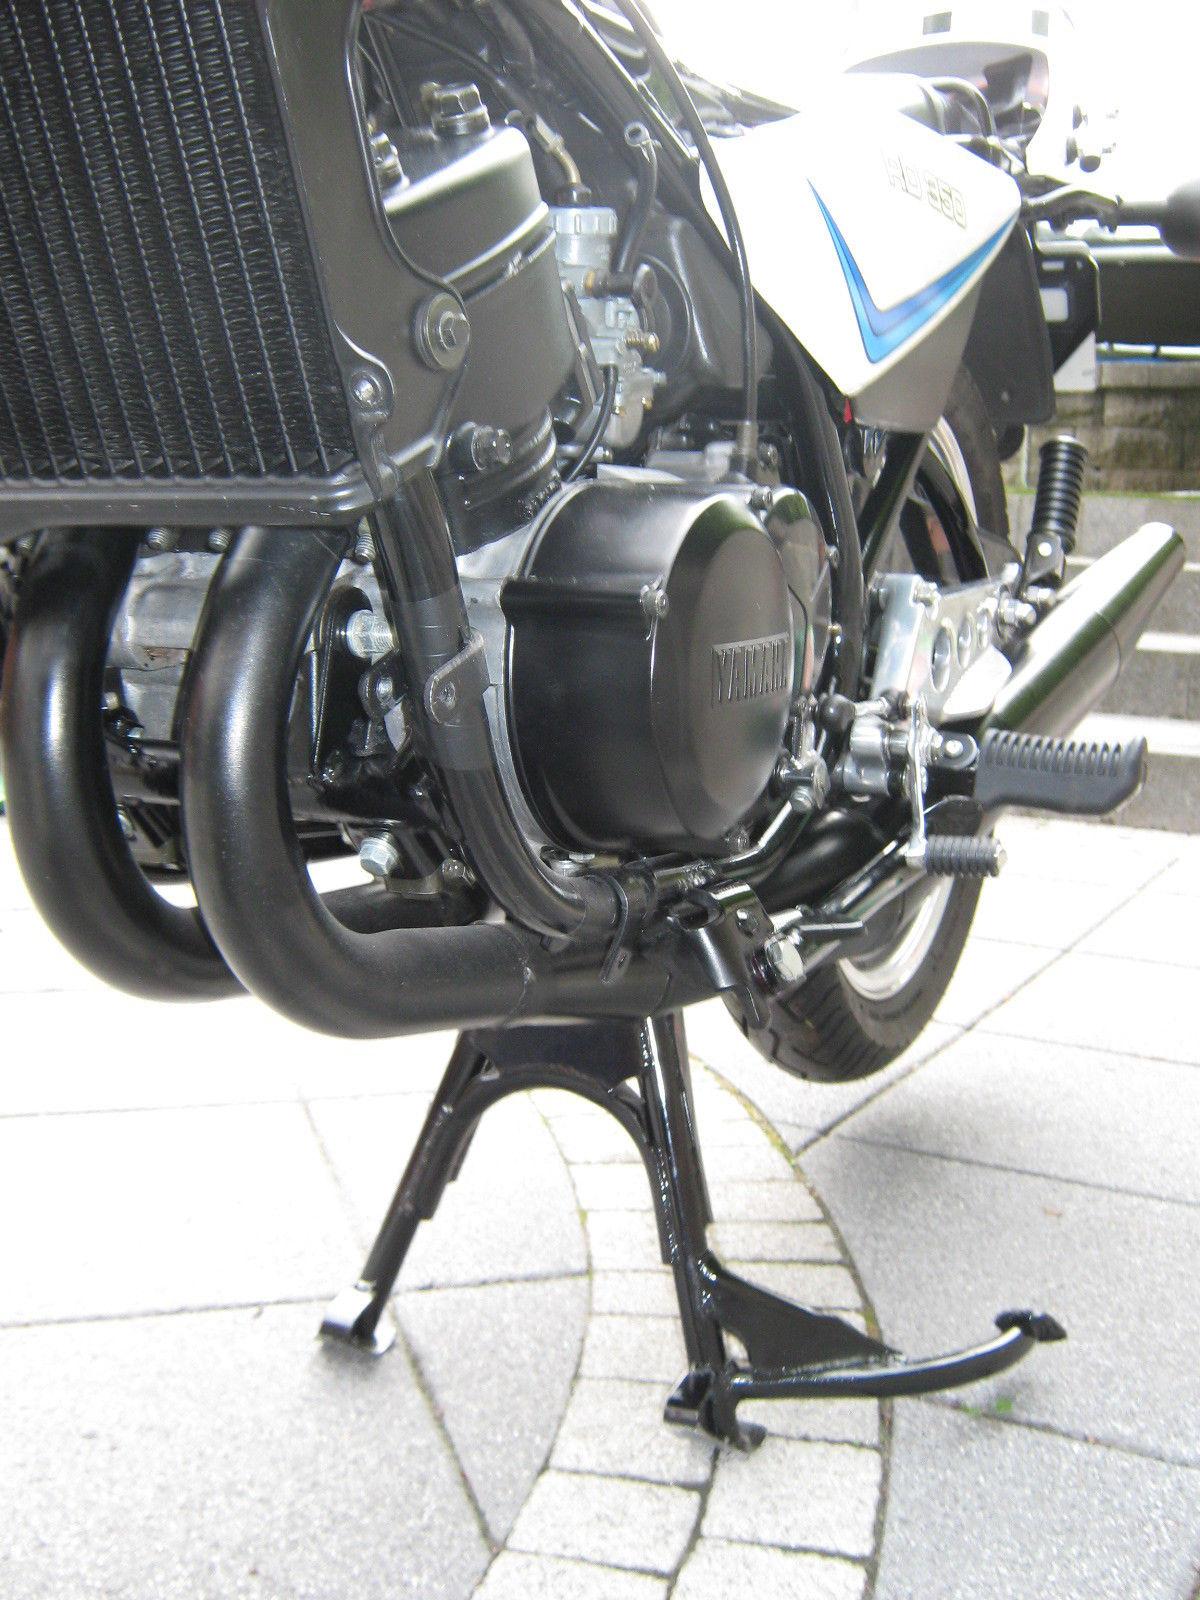 Yamaha RD350LC - 1983 - Radiator, Exhaust, Engine and Stand.